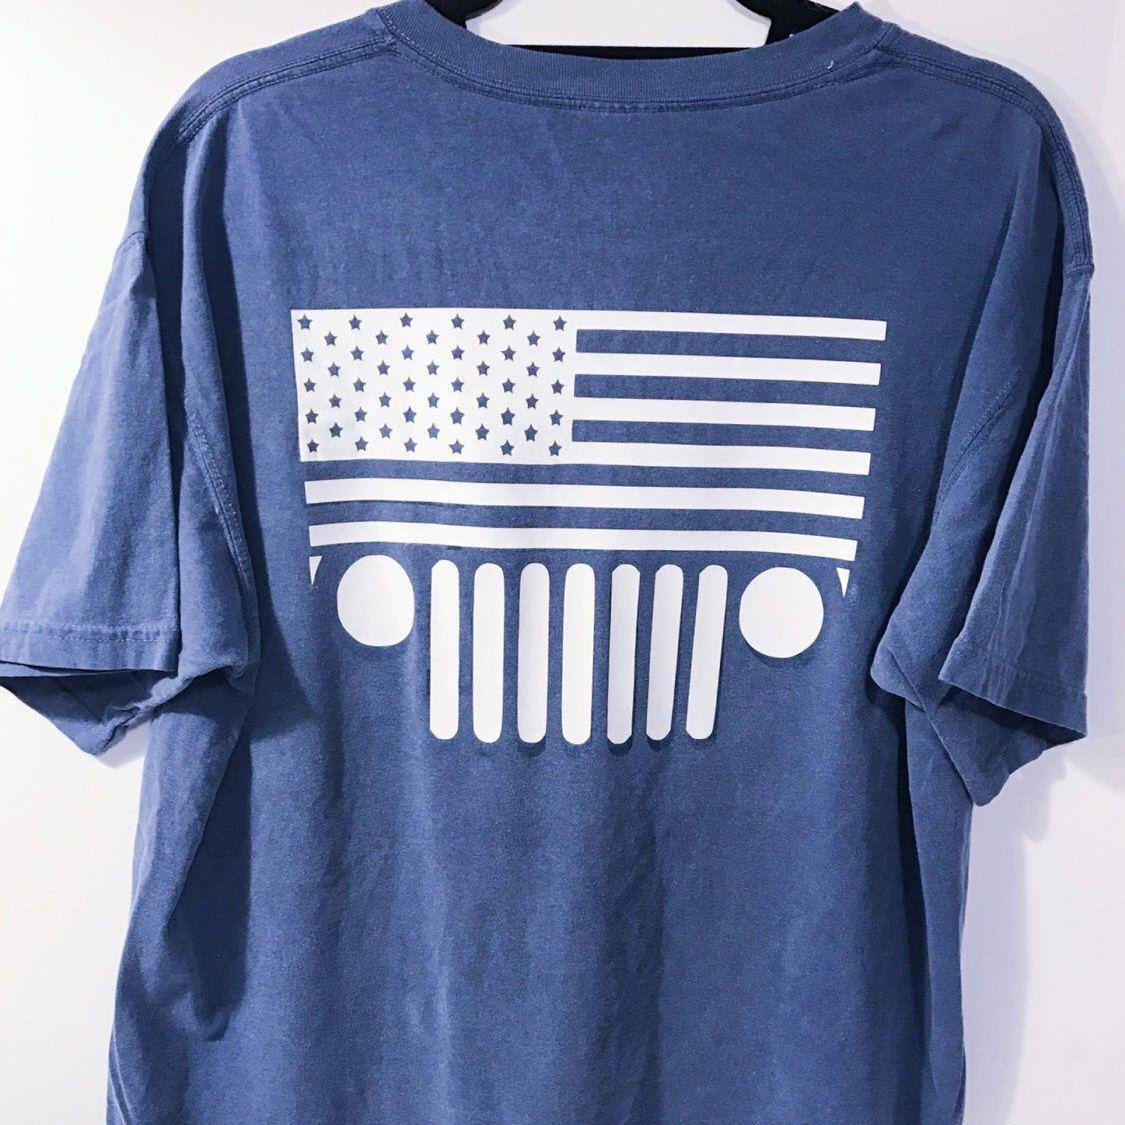 Jeep shirt american flag shirt jeep symbol home state shirt jeep shirt american flag shirt jeep symbol home state shirt jk symbol biocorpaavc Gallery